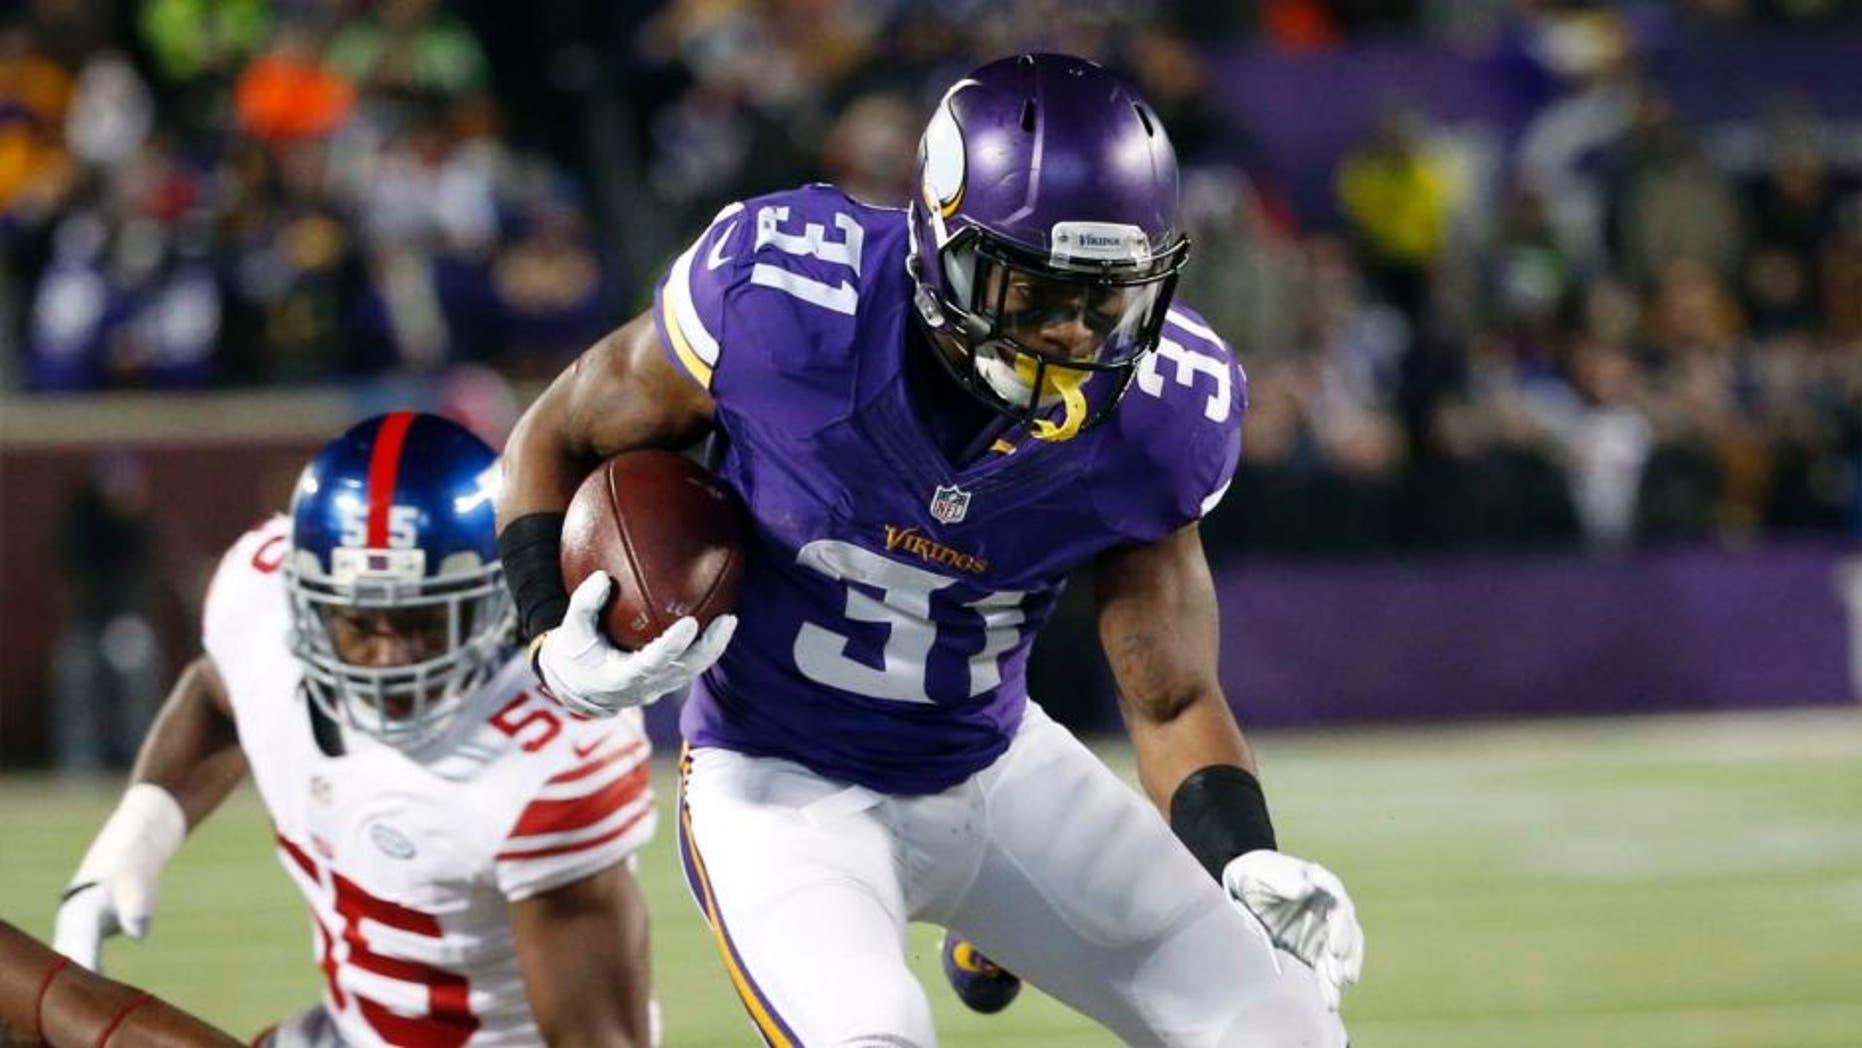 Minnesota Vikings running back Jerick McKinnon jumps over New York Giants defenders during the first half Sunday, Dec. 27, 2015, in Minneapolis.